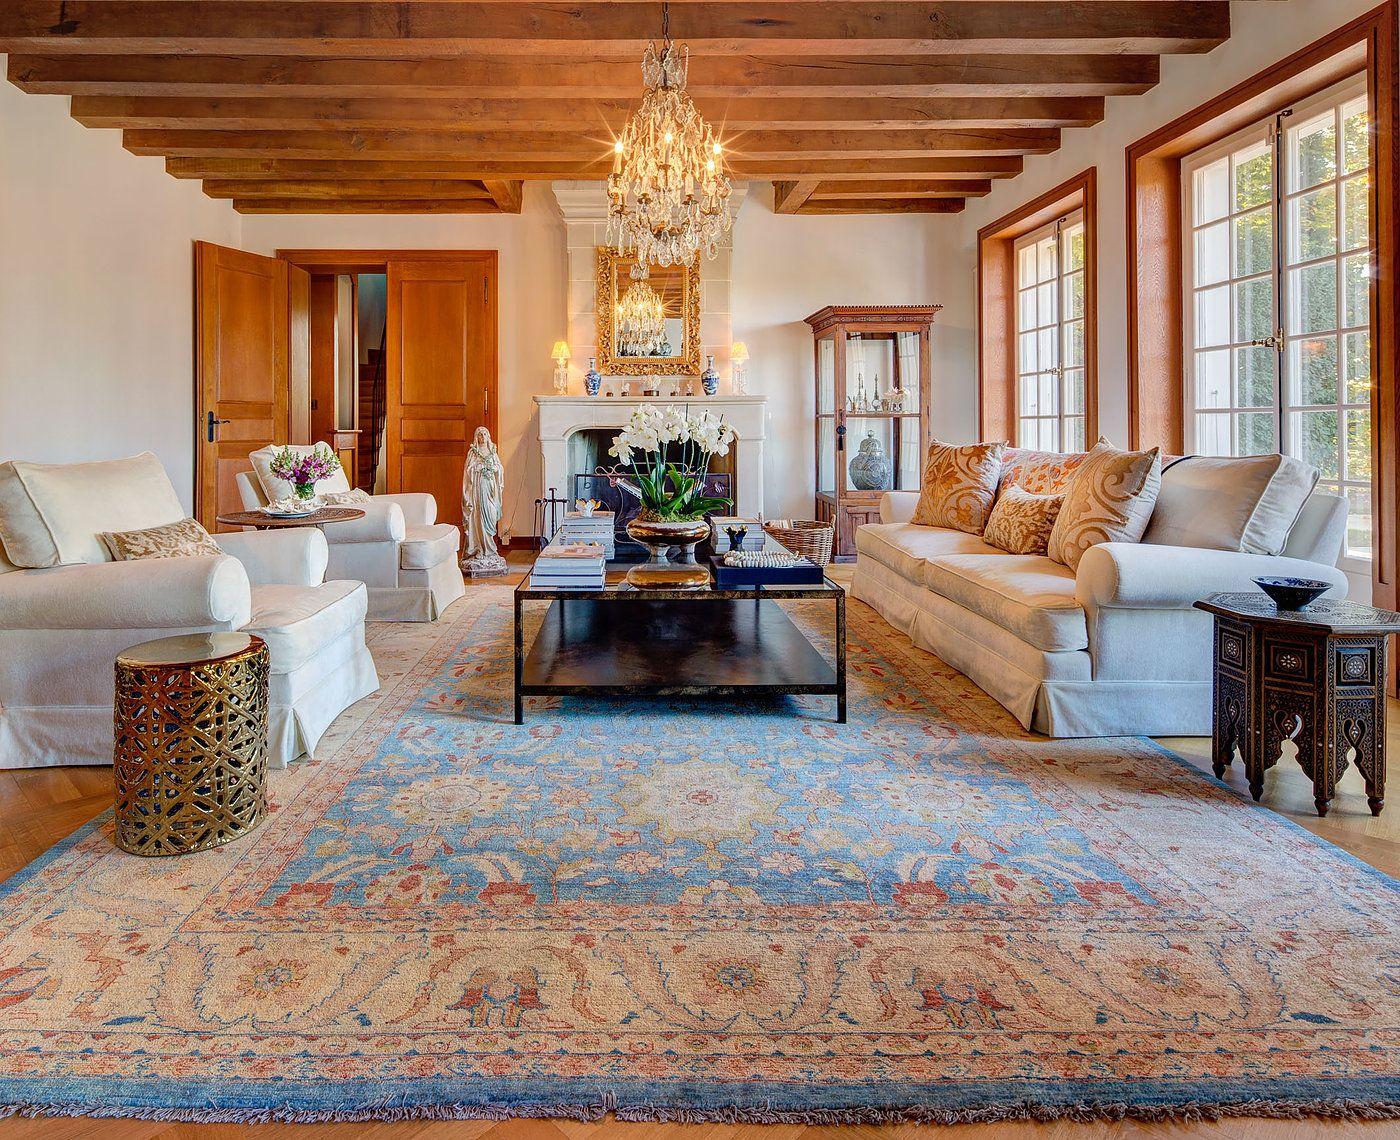 Jennie schmid design interior design designer